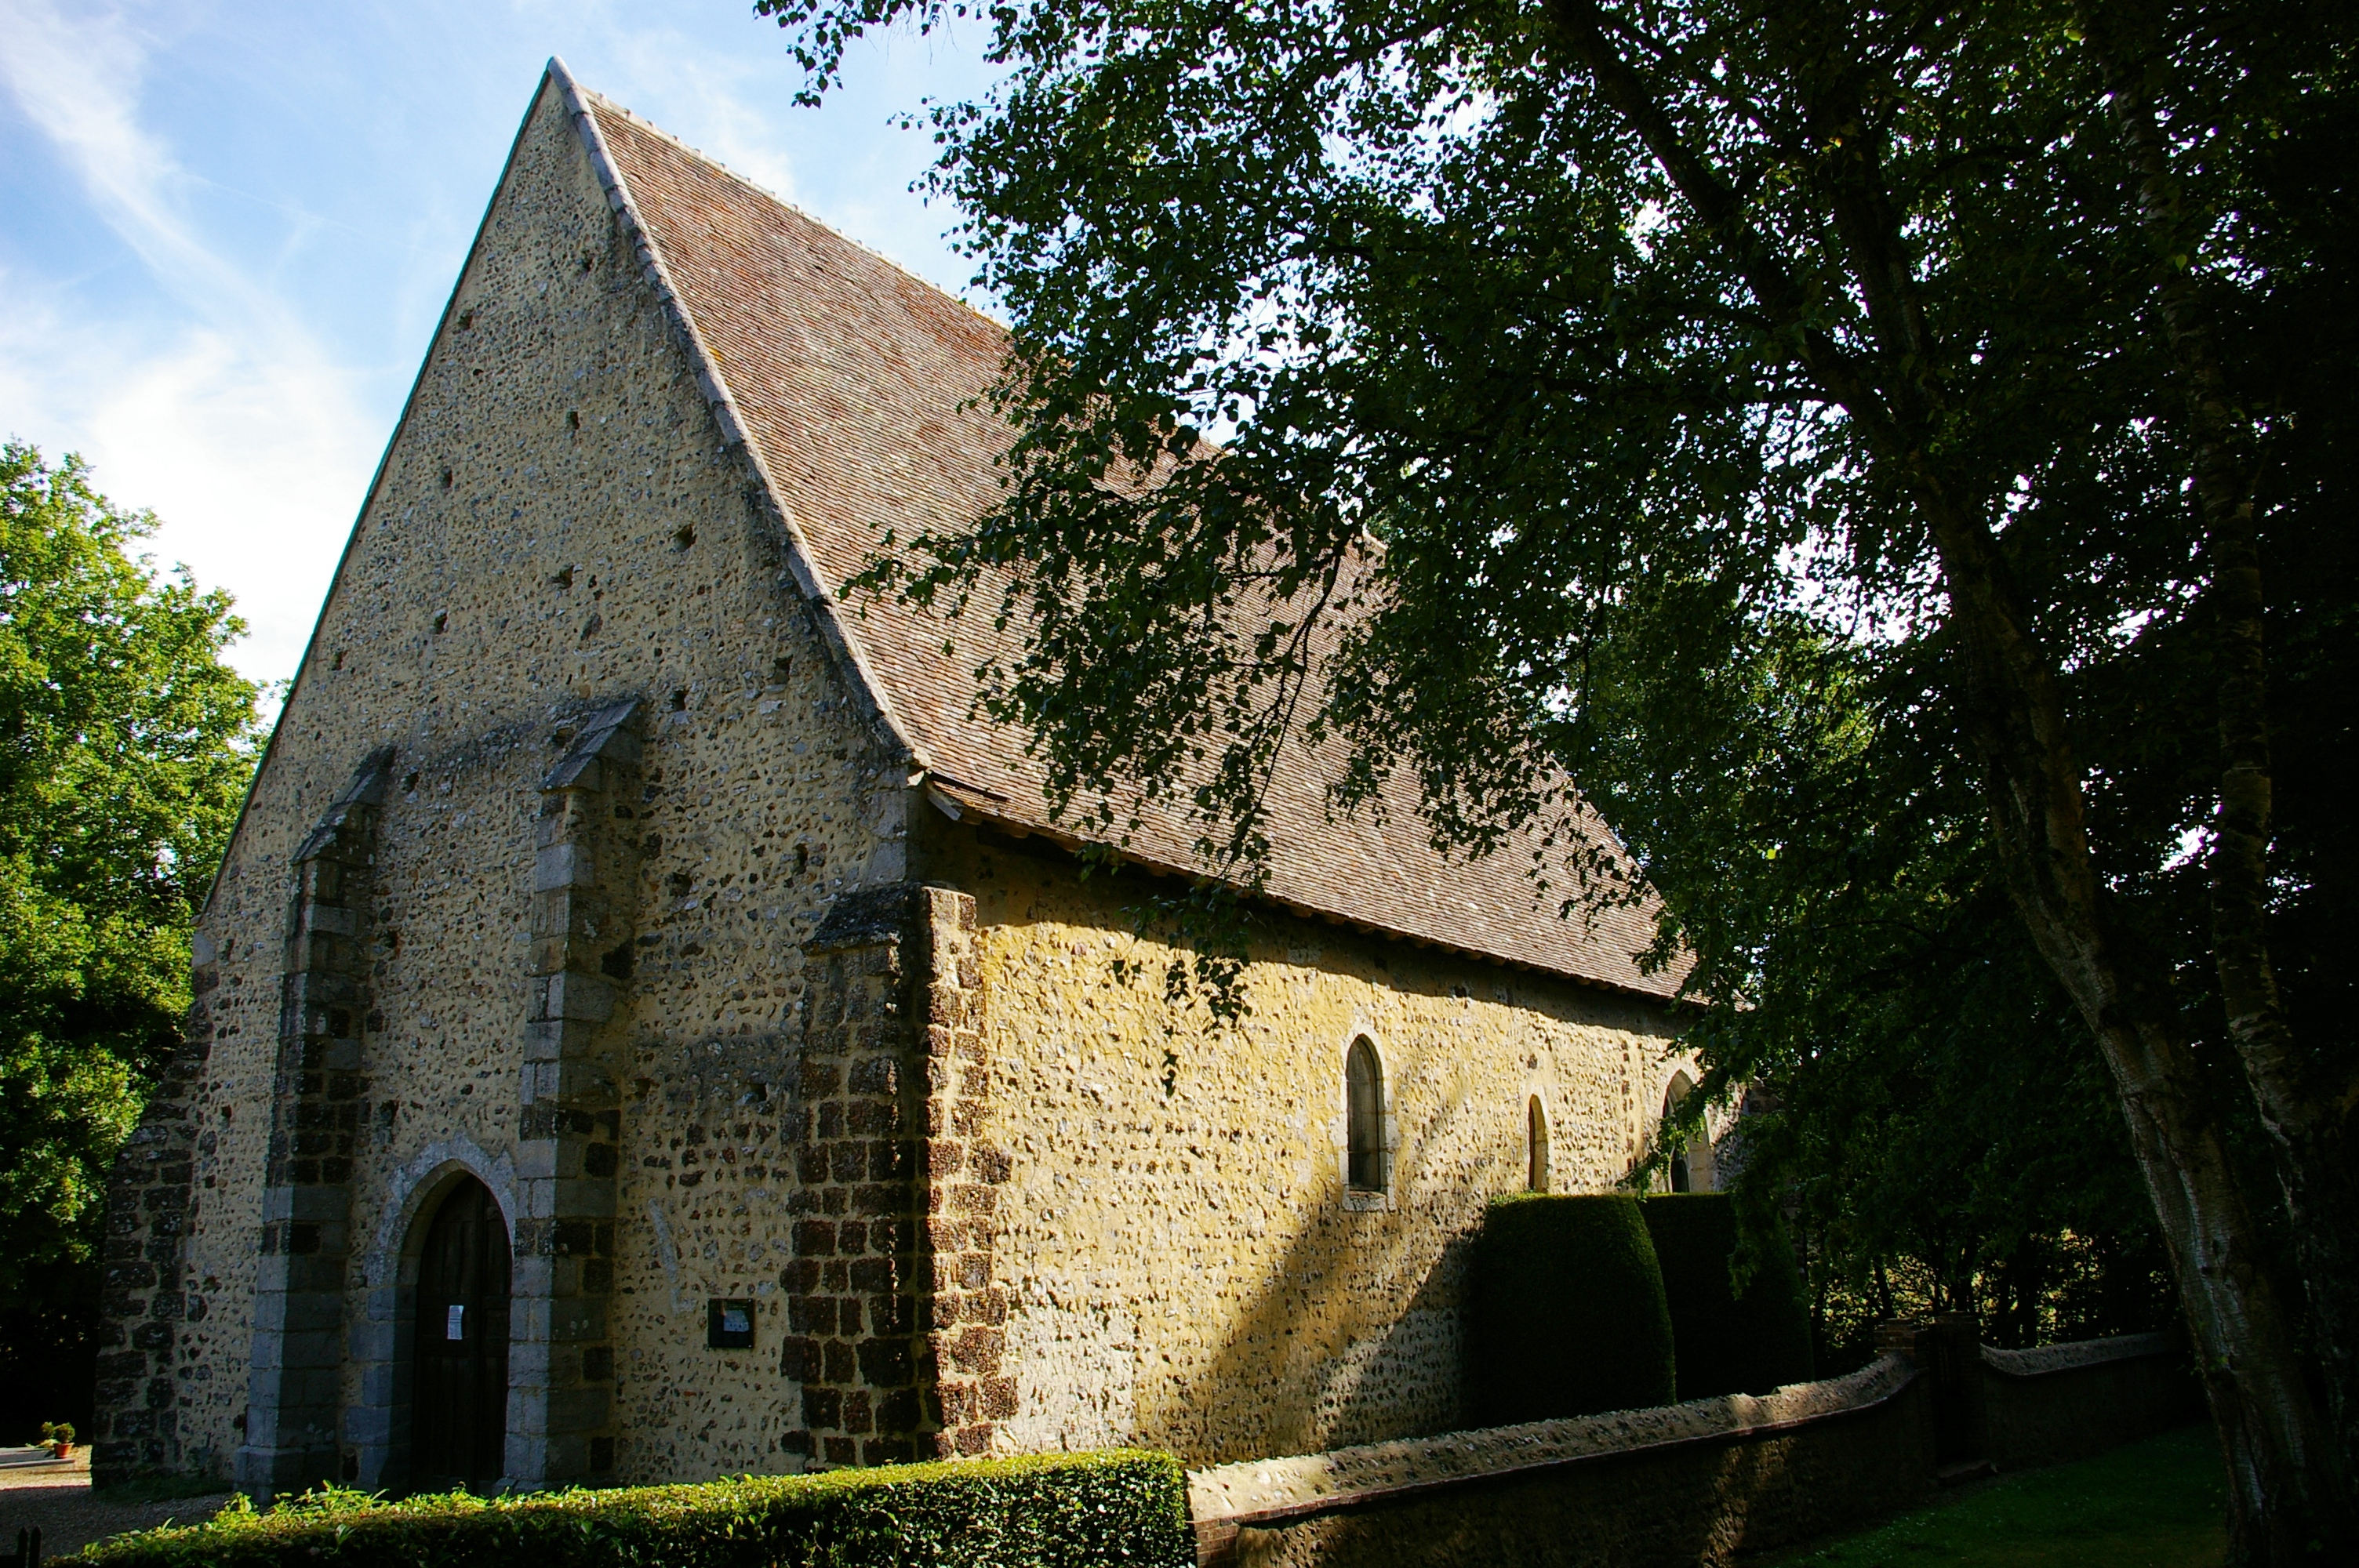 Chapelle de Réveillon - Chapelle de Réveillon